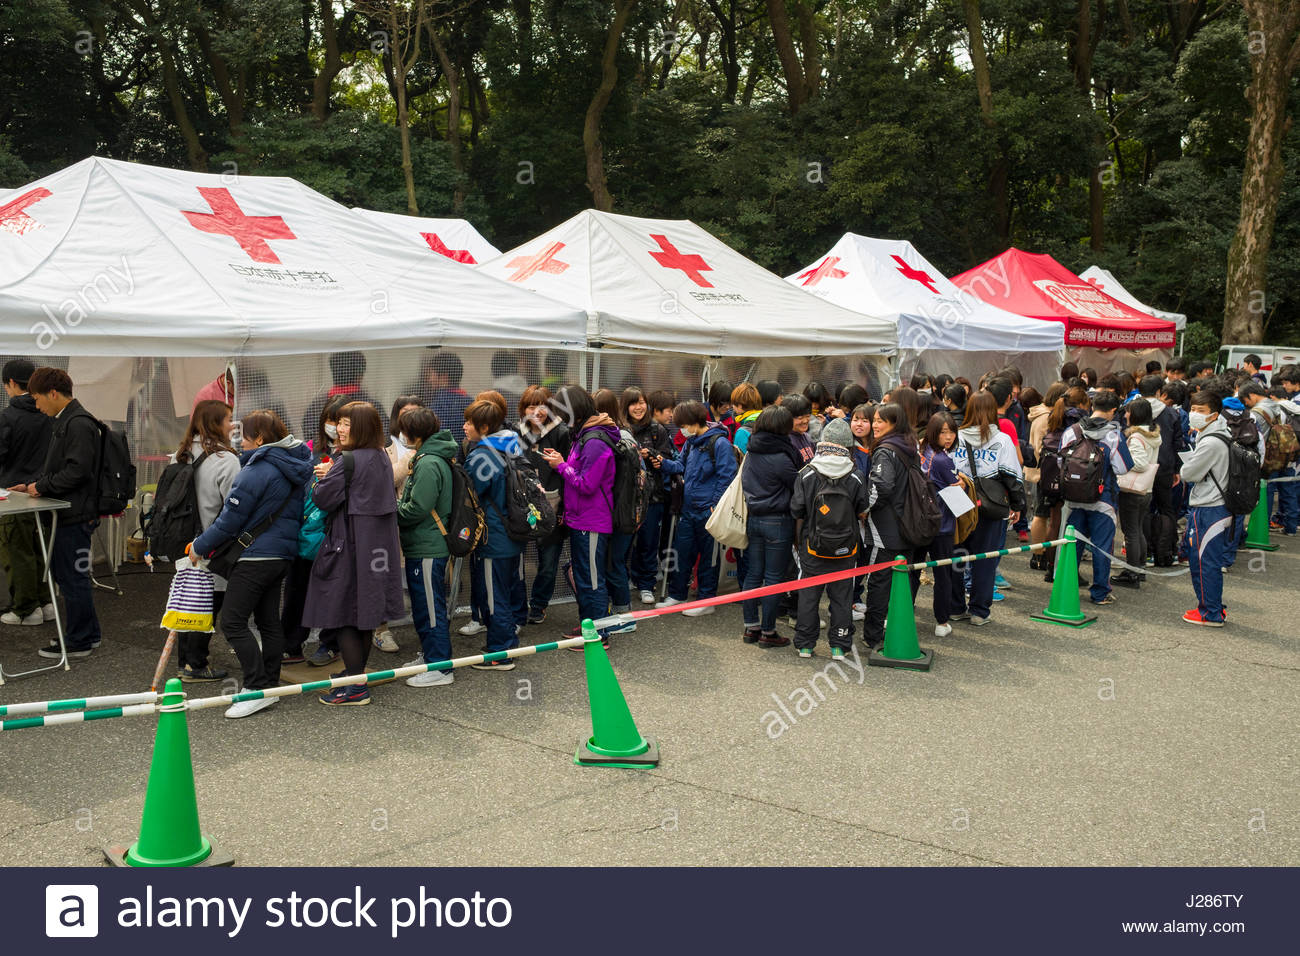 Young people standing in line to donate blood, Meiji Jingu, Shibuya, Tokyo, Honshu, Japan - Stock Image